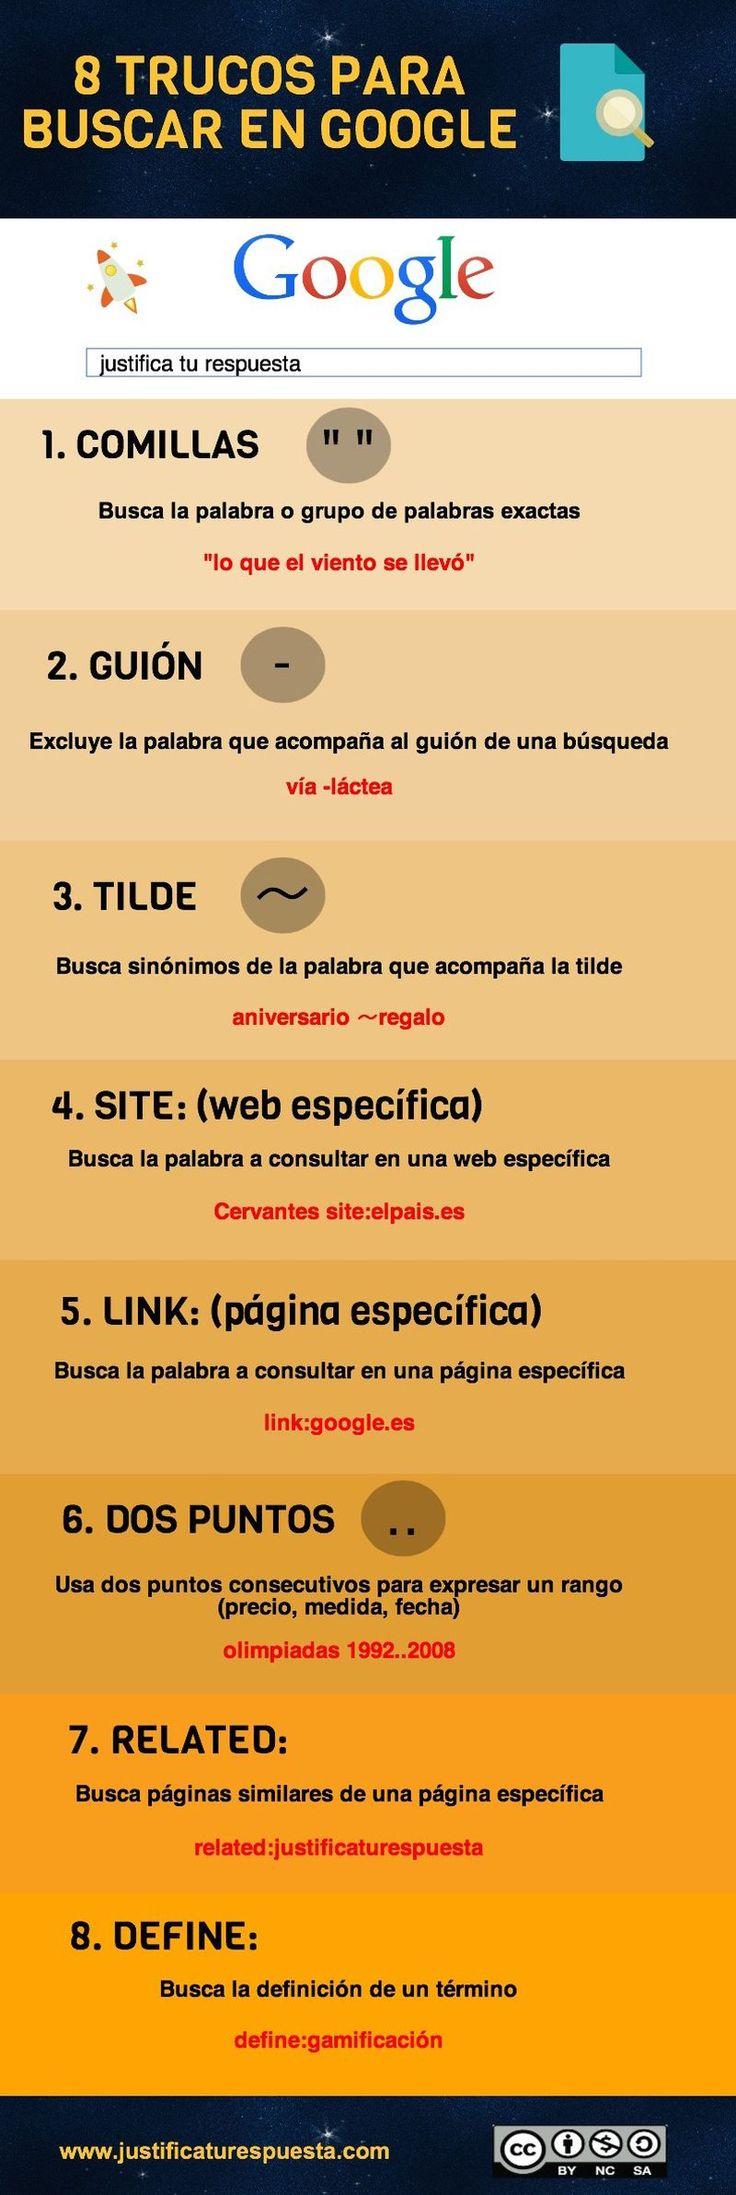 8 trucos para tus búsquedas en Google